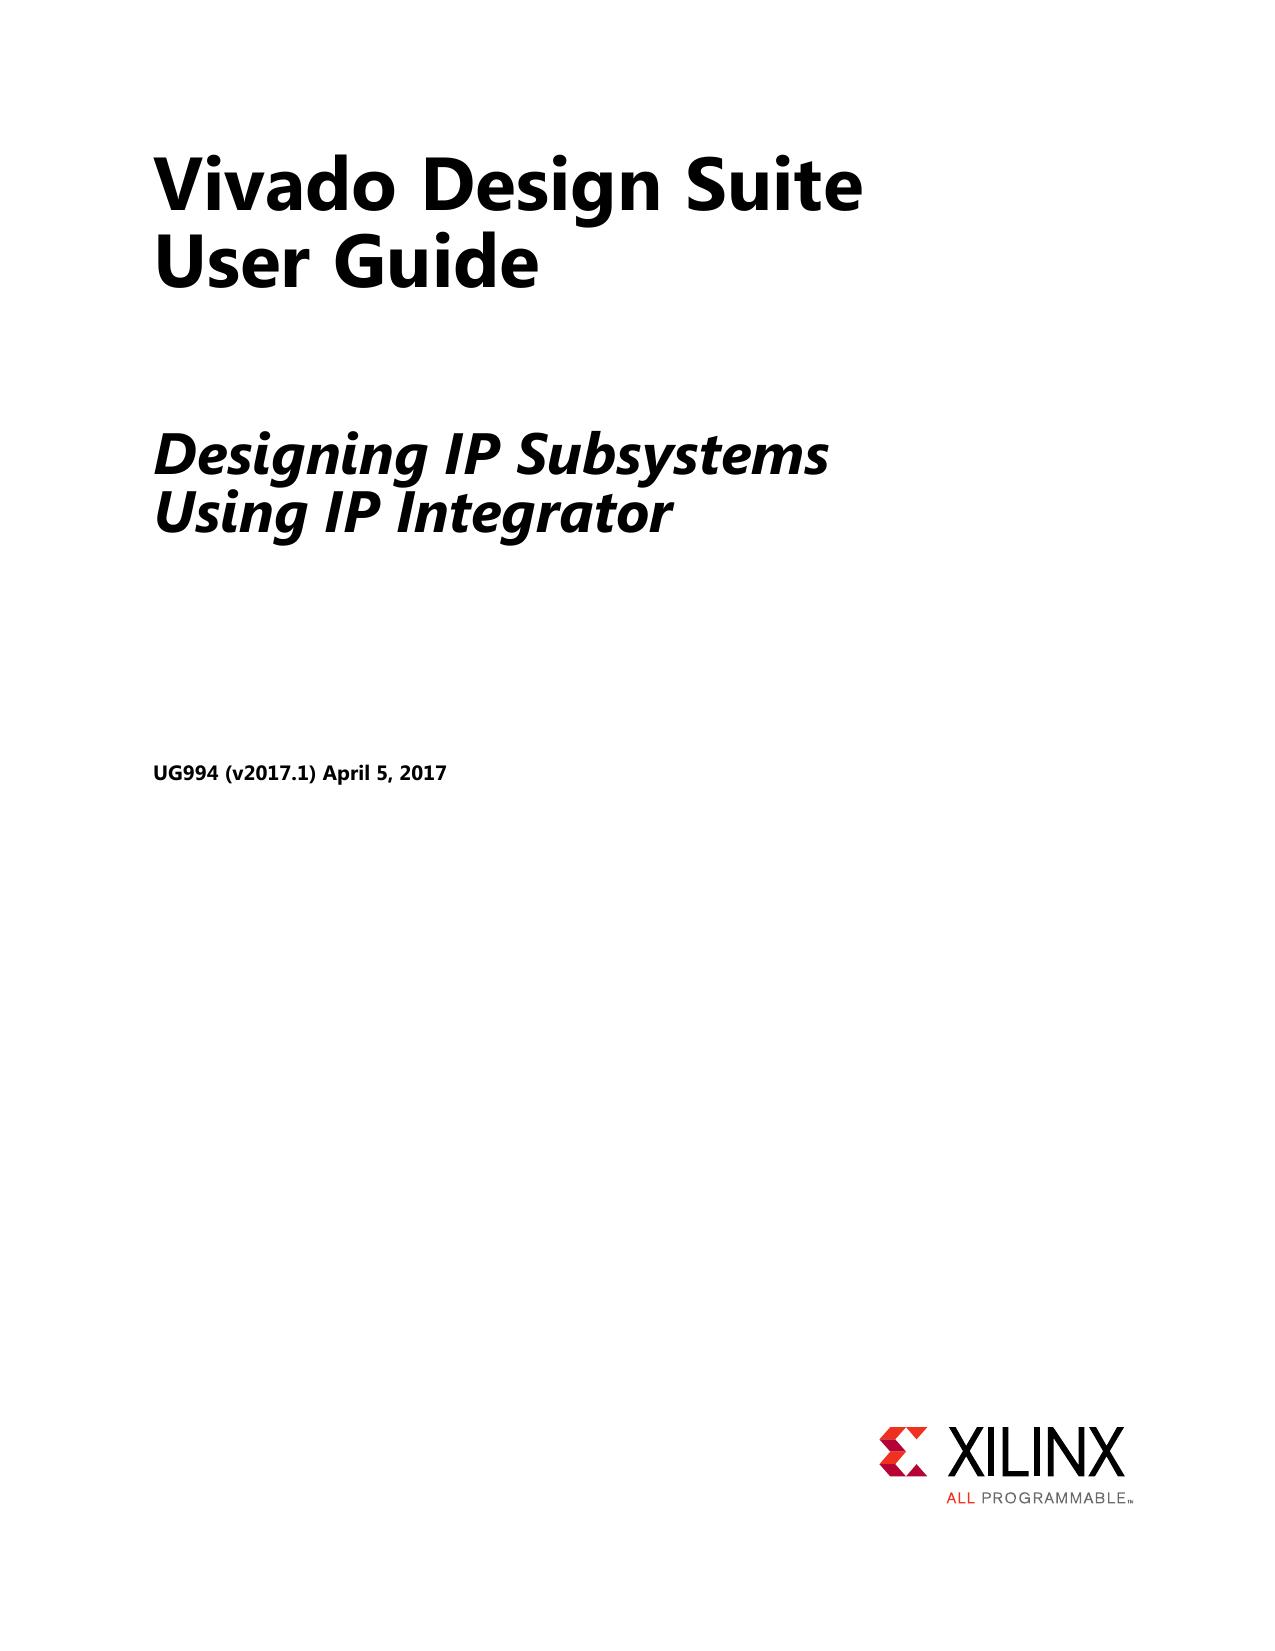 Designing IP Subsystems Using IP Integrator (UG994) | manualzz com